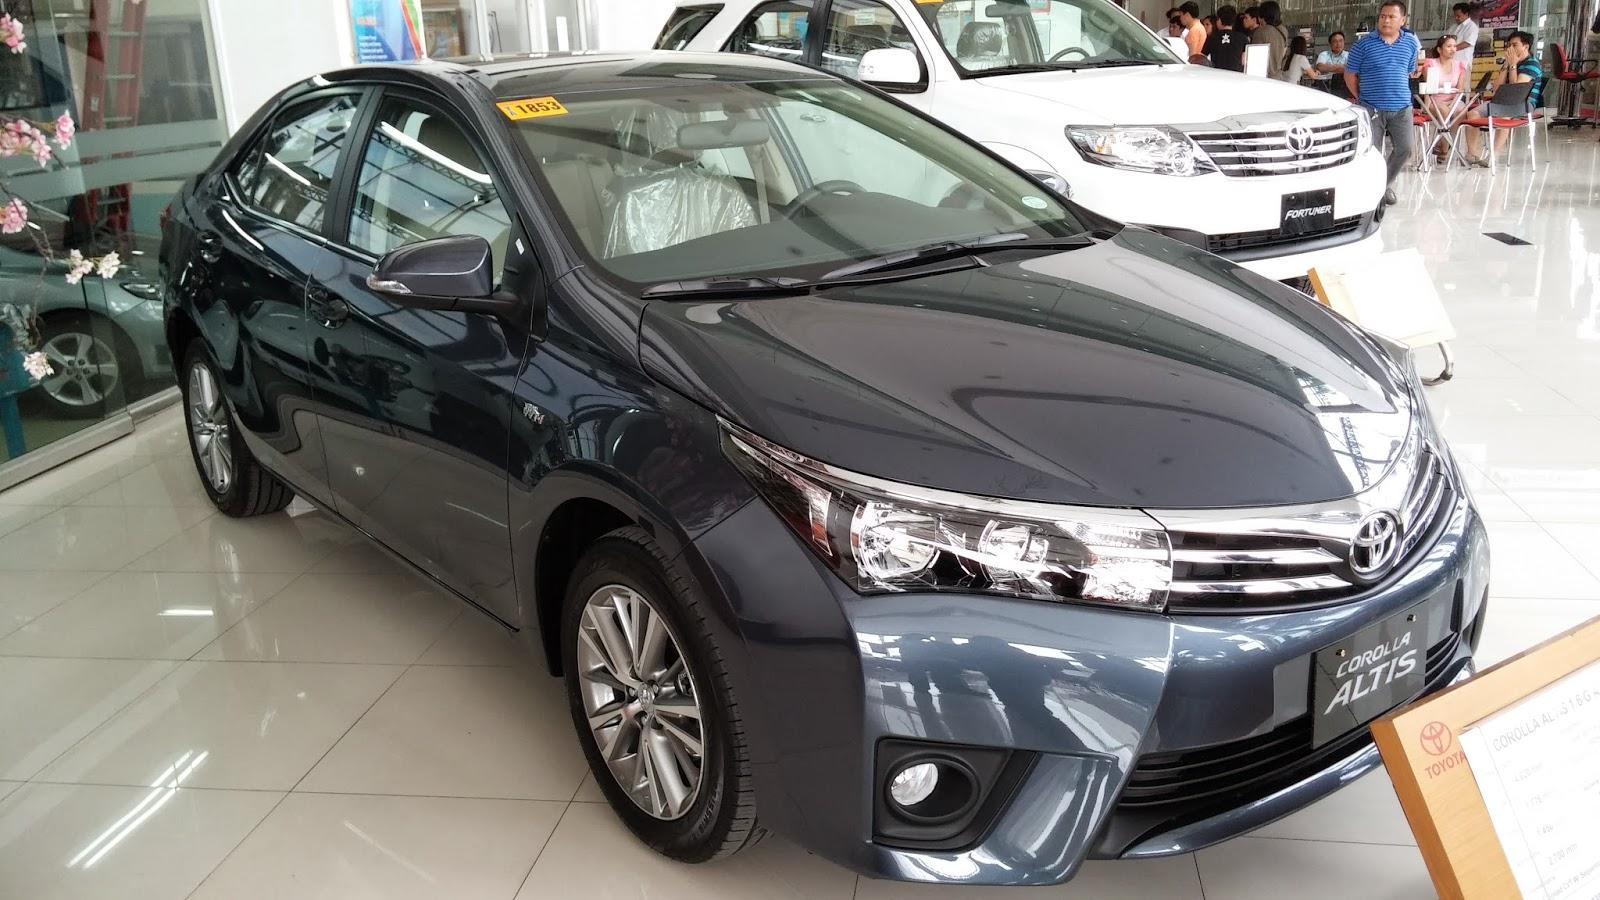 All New Camry Black Harga Mobil Grand Avanza 2015 Toyota Corolla Altis 2014 Lakbay Atbp